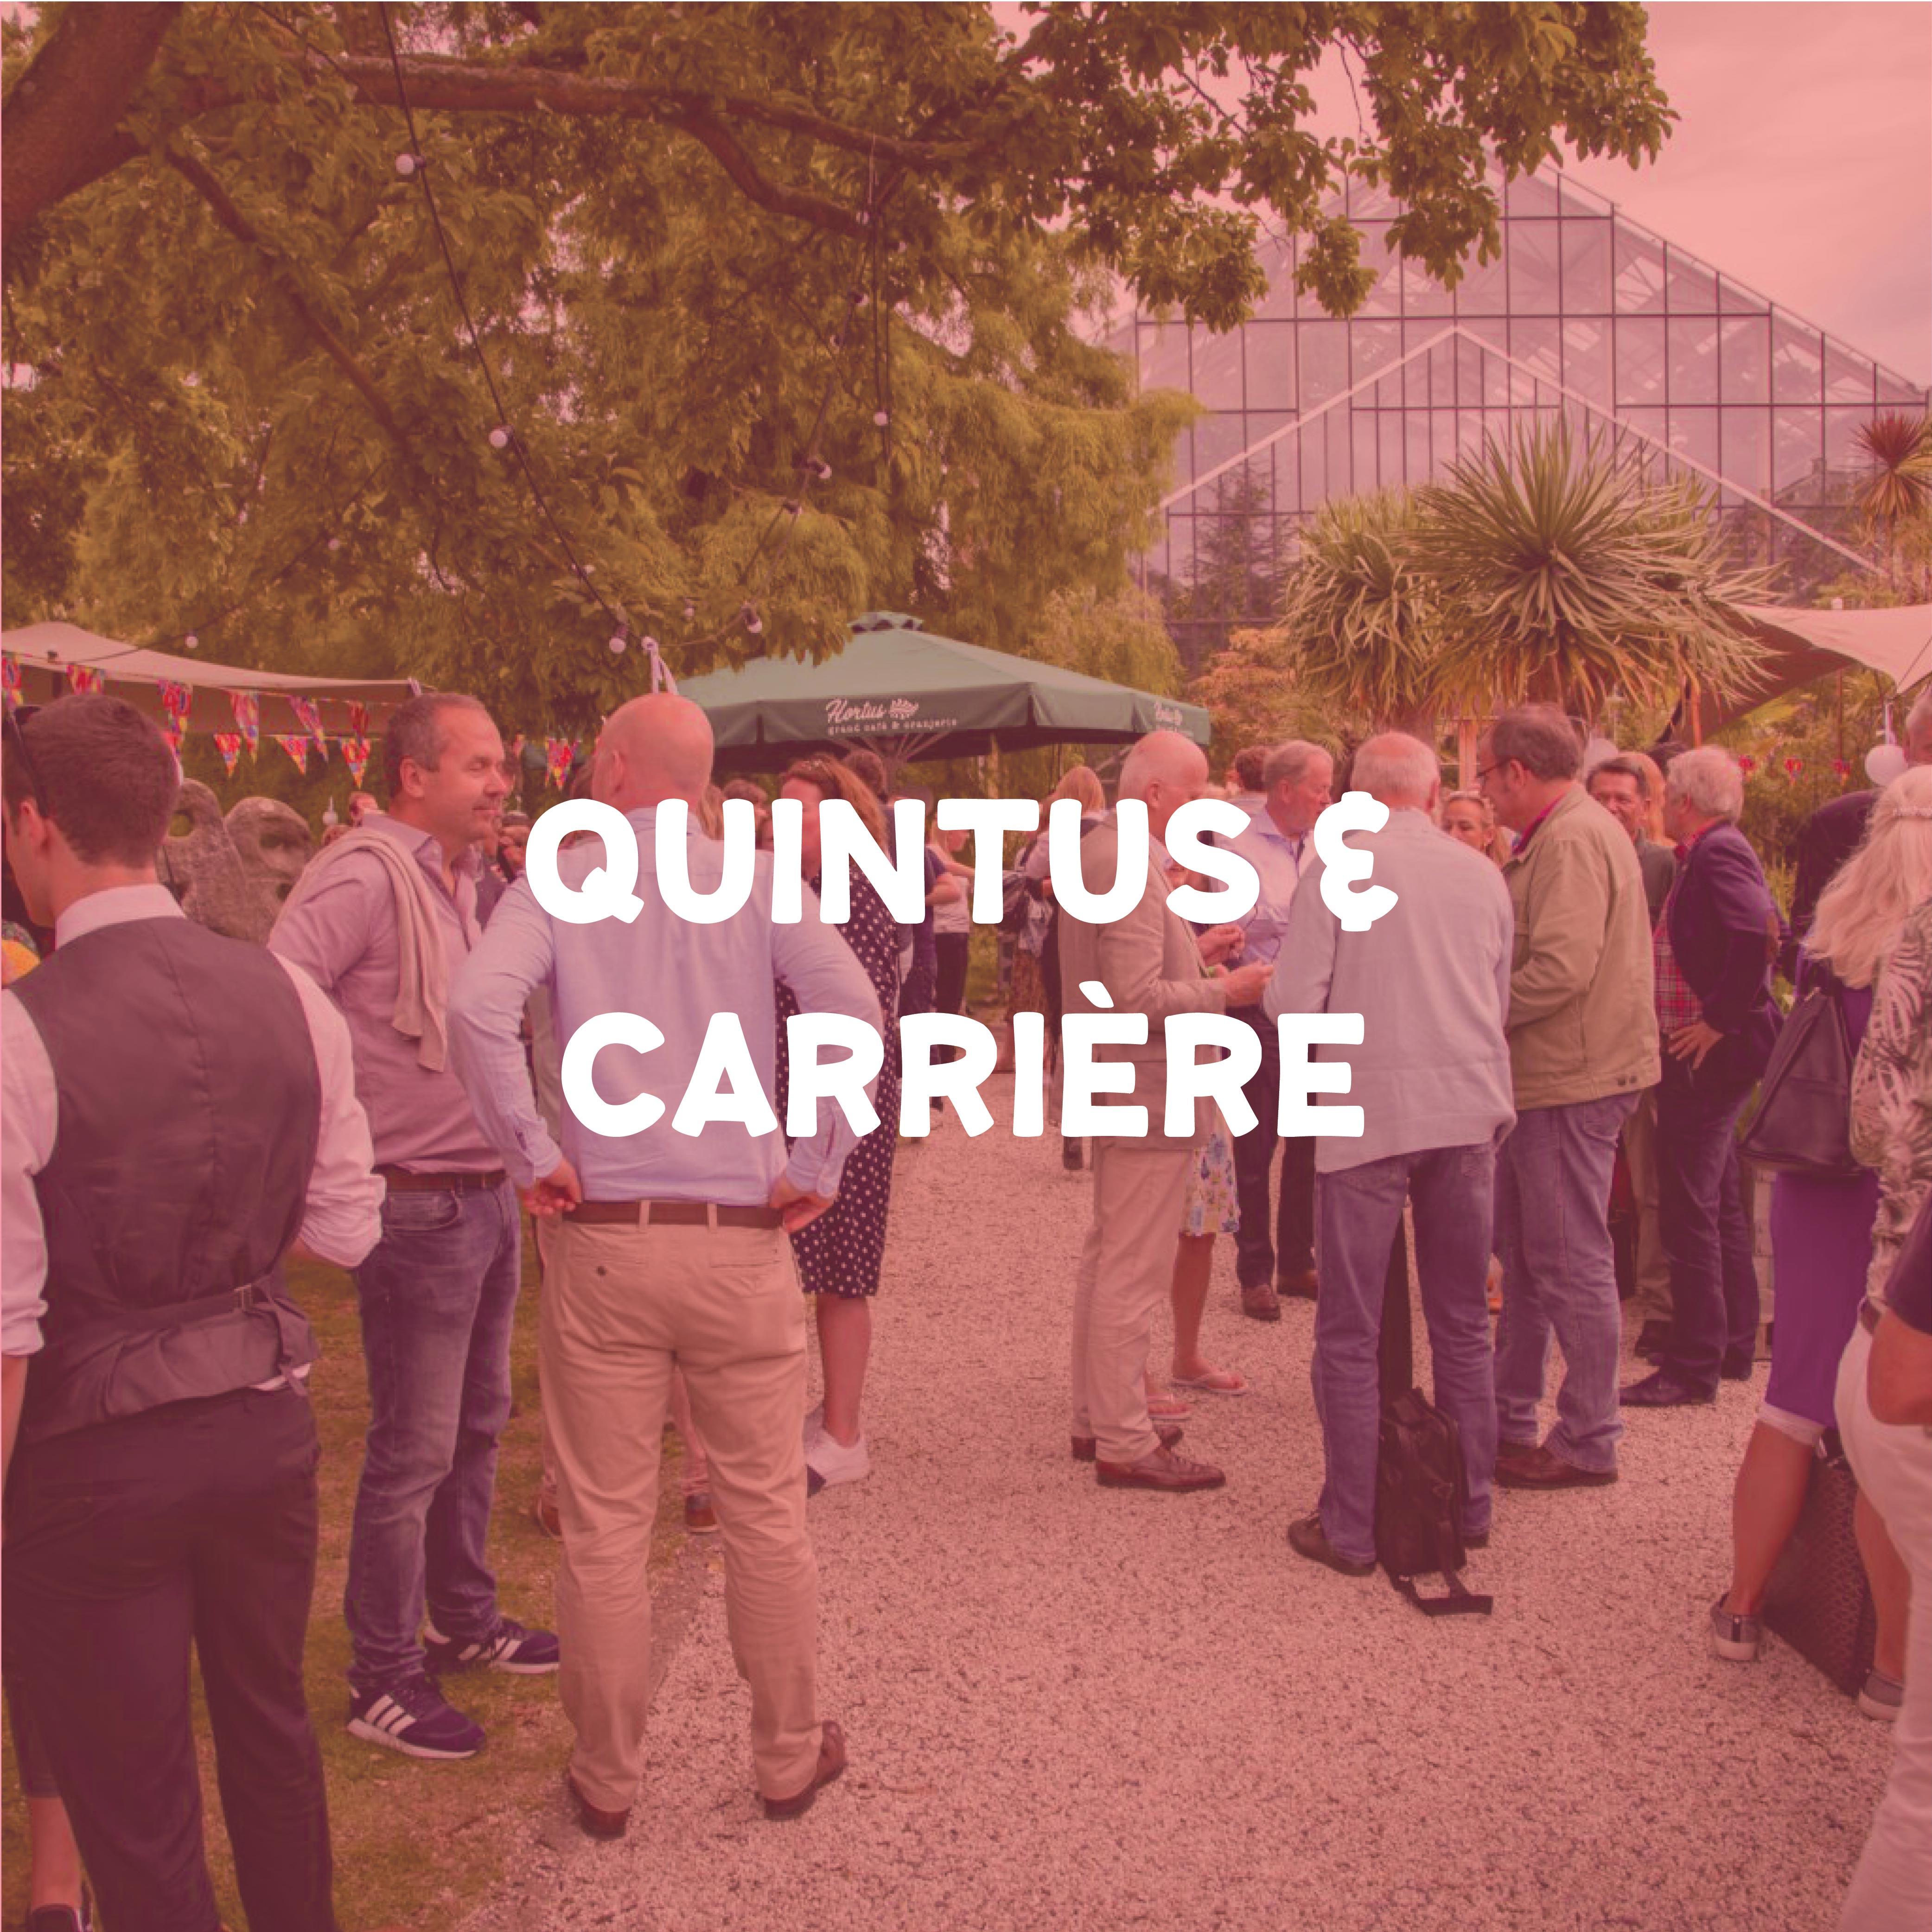 Quintus & carriere